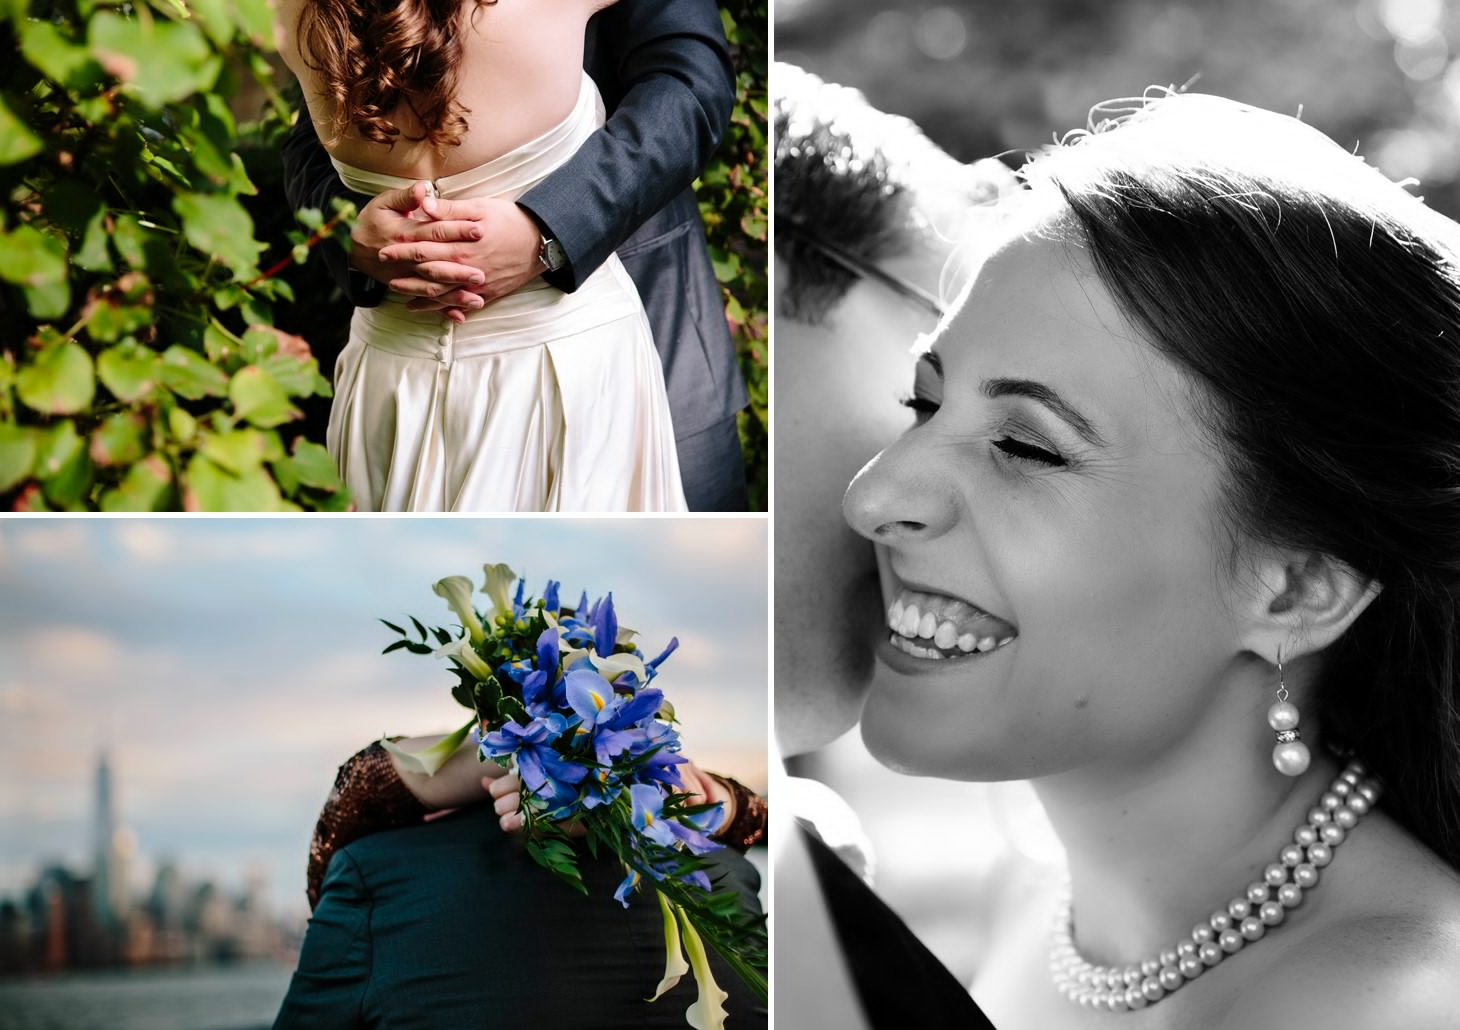 035-nyc-wedding-photographer-smitten-chickens-elope-nyc-wedding-photographer-museum-wedding-smitten-chickens-hoboken.jpg